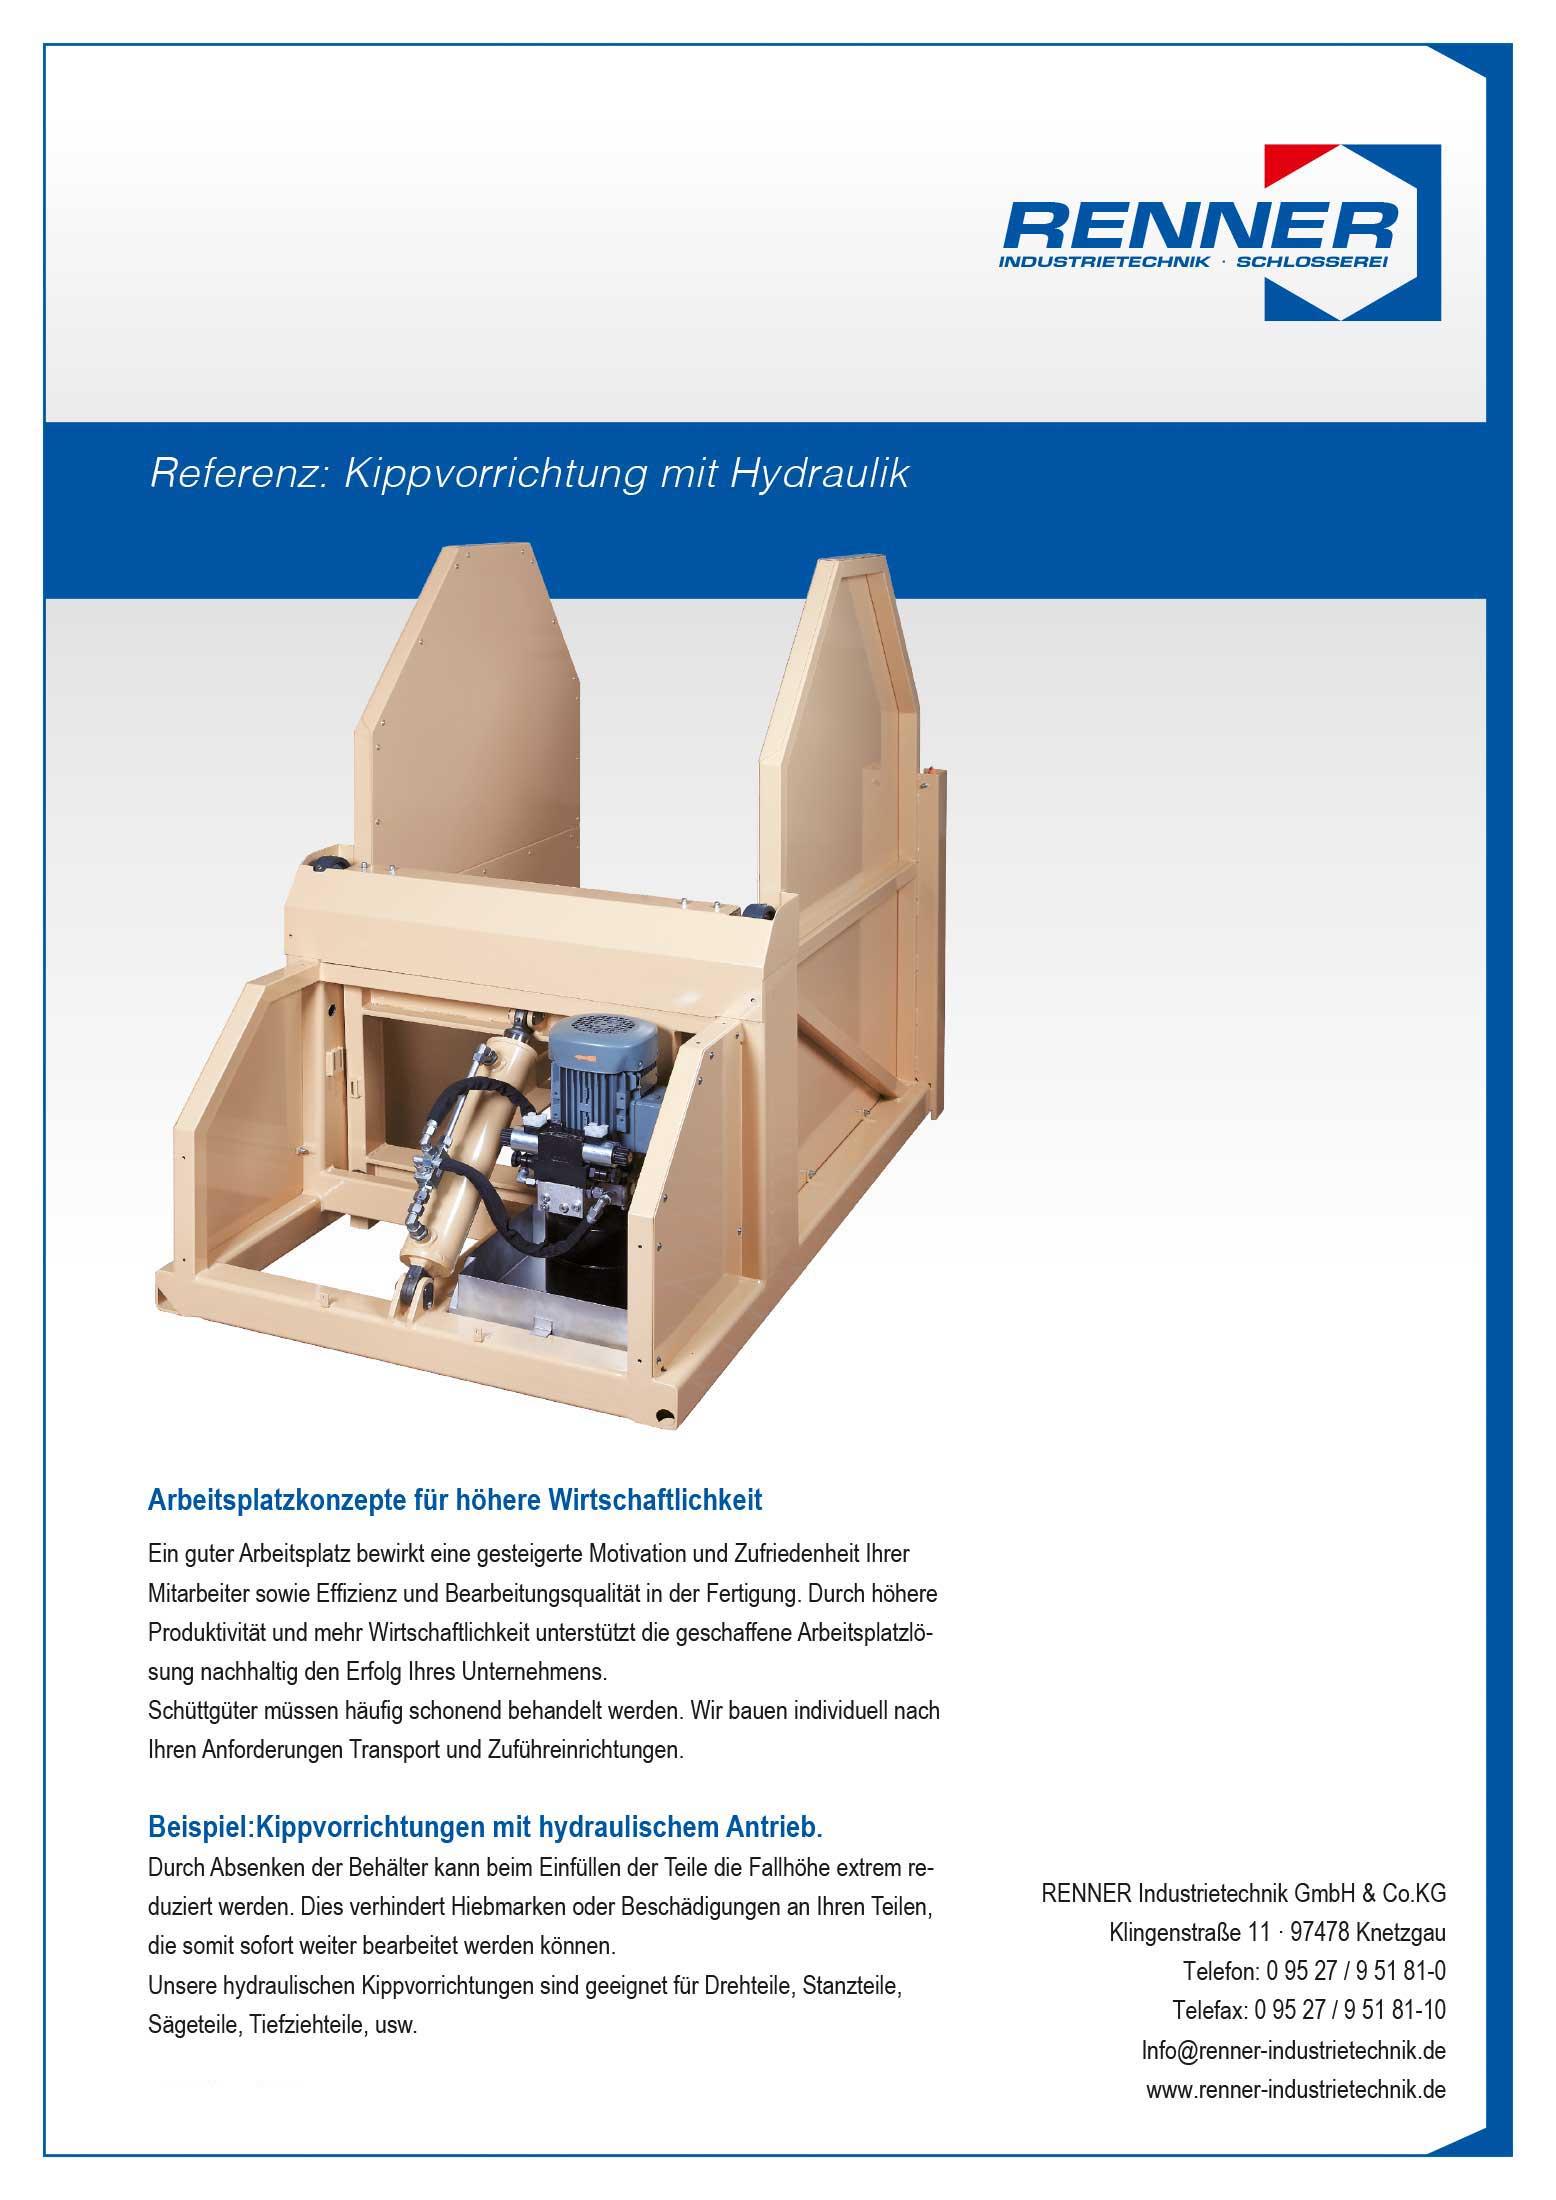 Referenz_Kippvorrichtung_Hydraulik_web